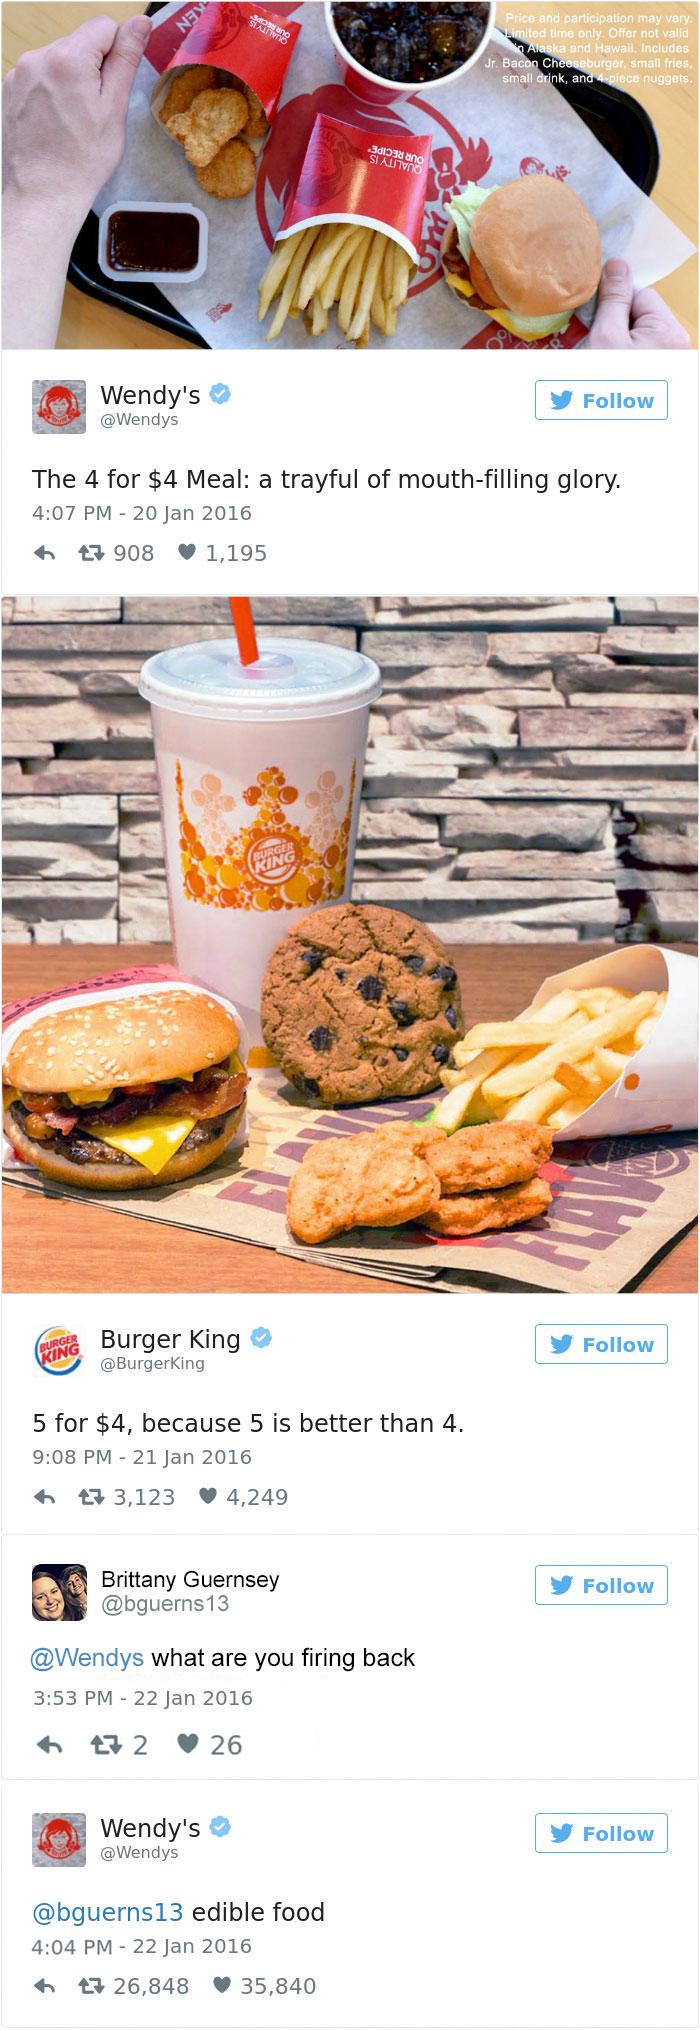 #3 Wendy's Versus Burger King